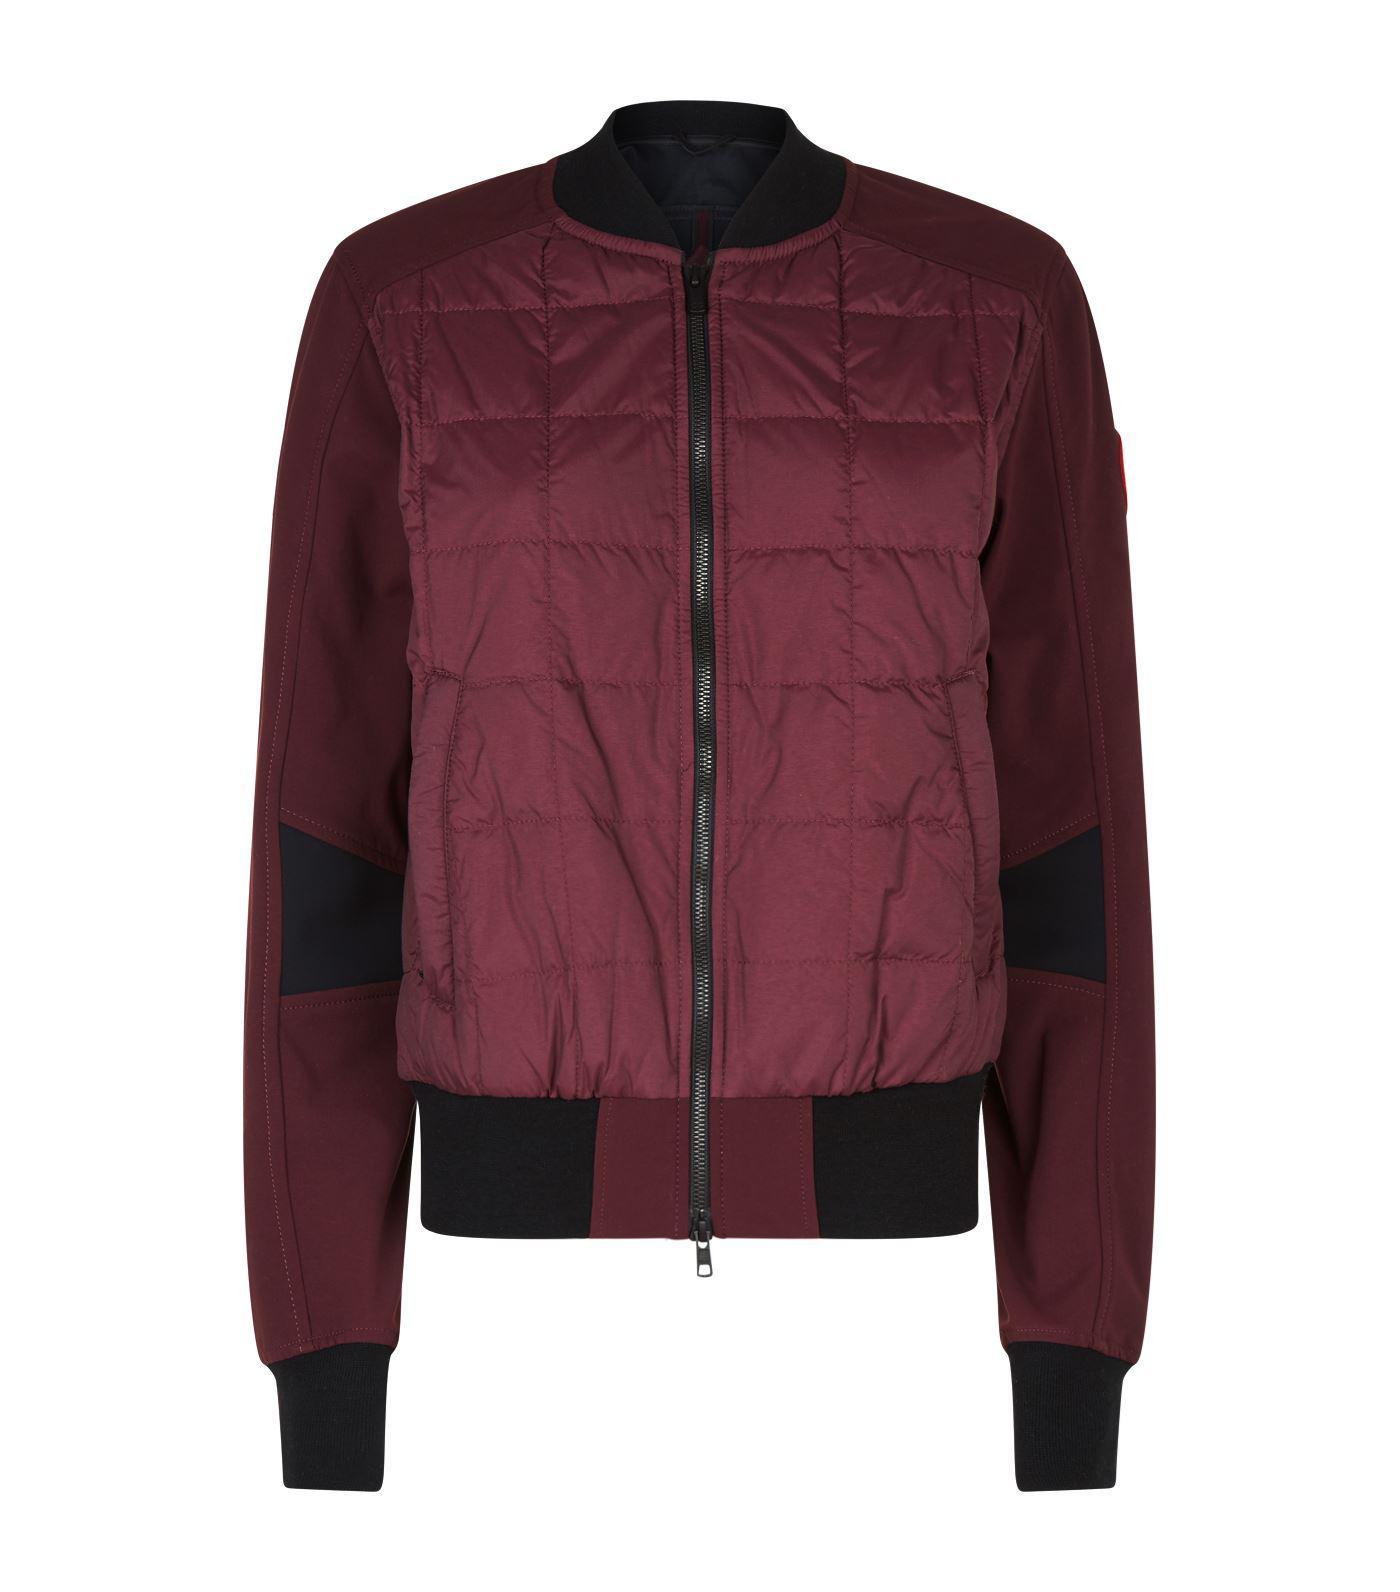 lyst canada goose hanley bomber jacket in purple for men rh lyst com